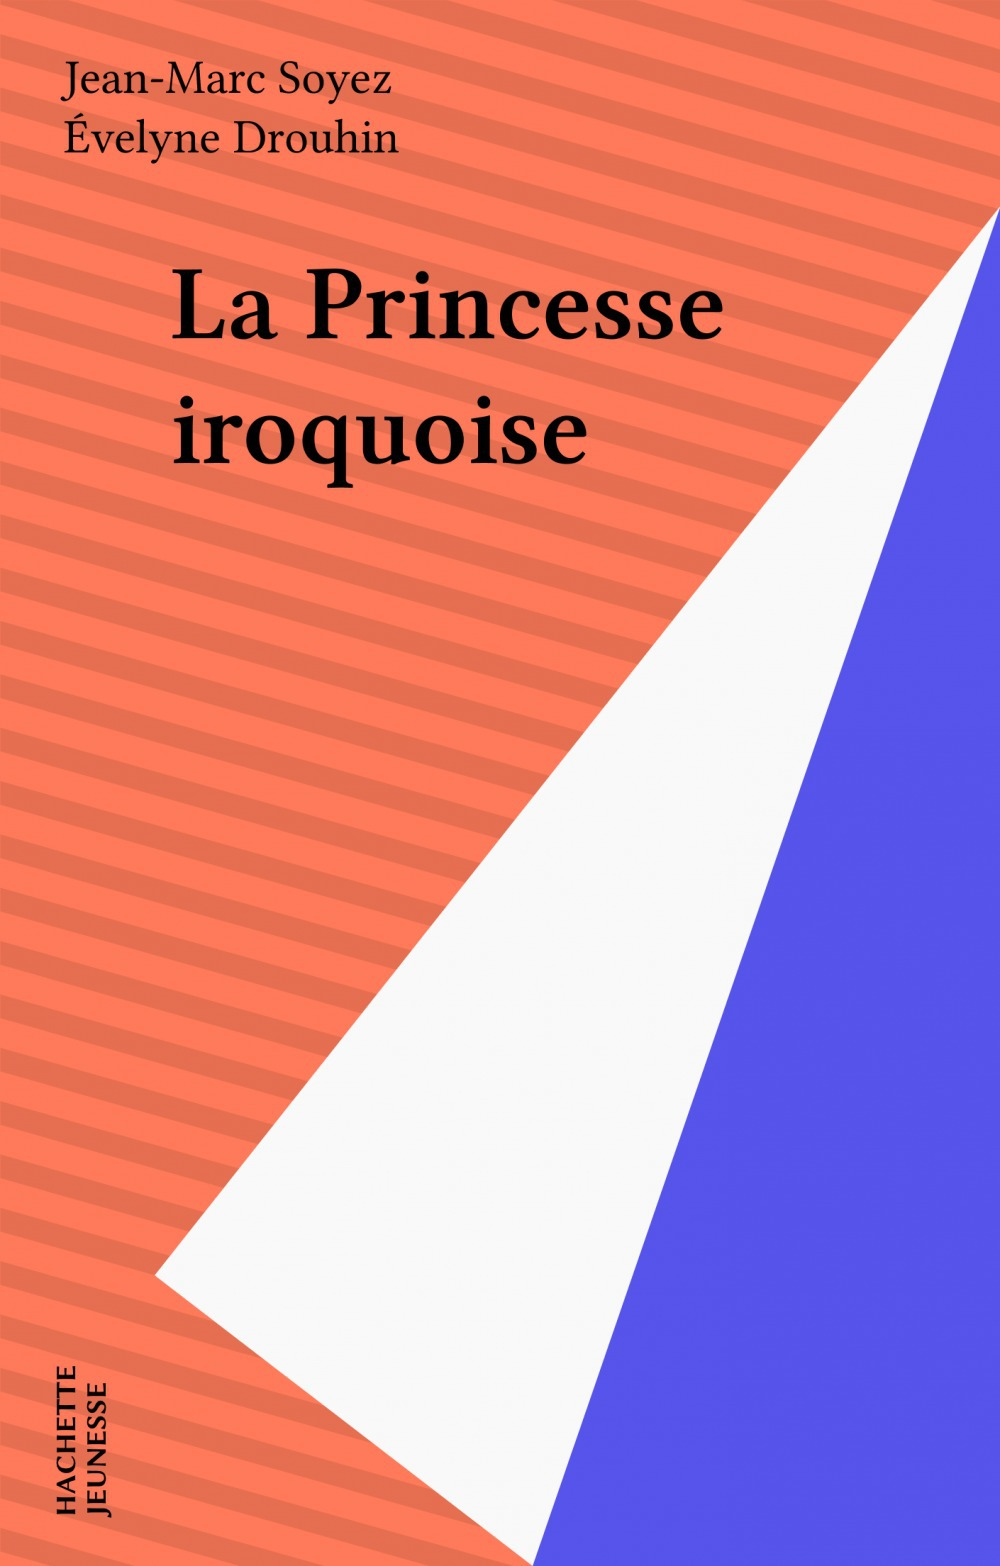 La princesse iroquoise